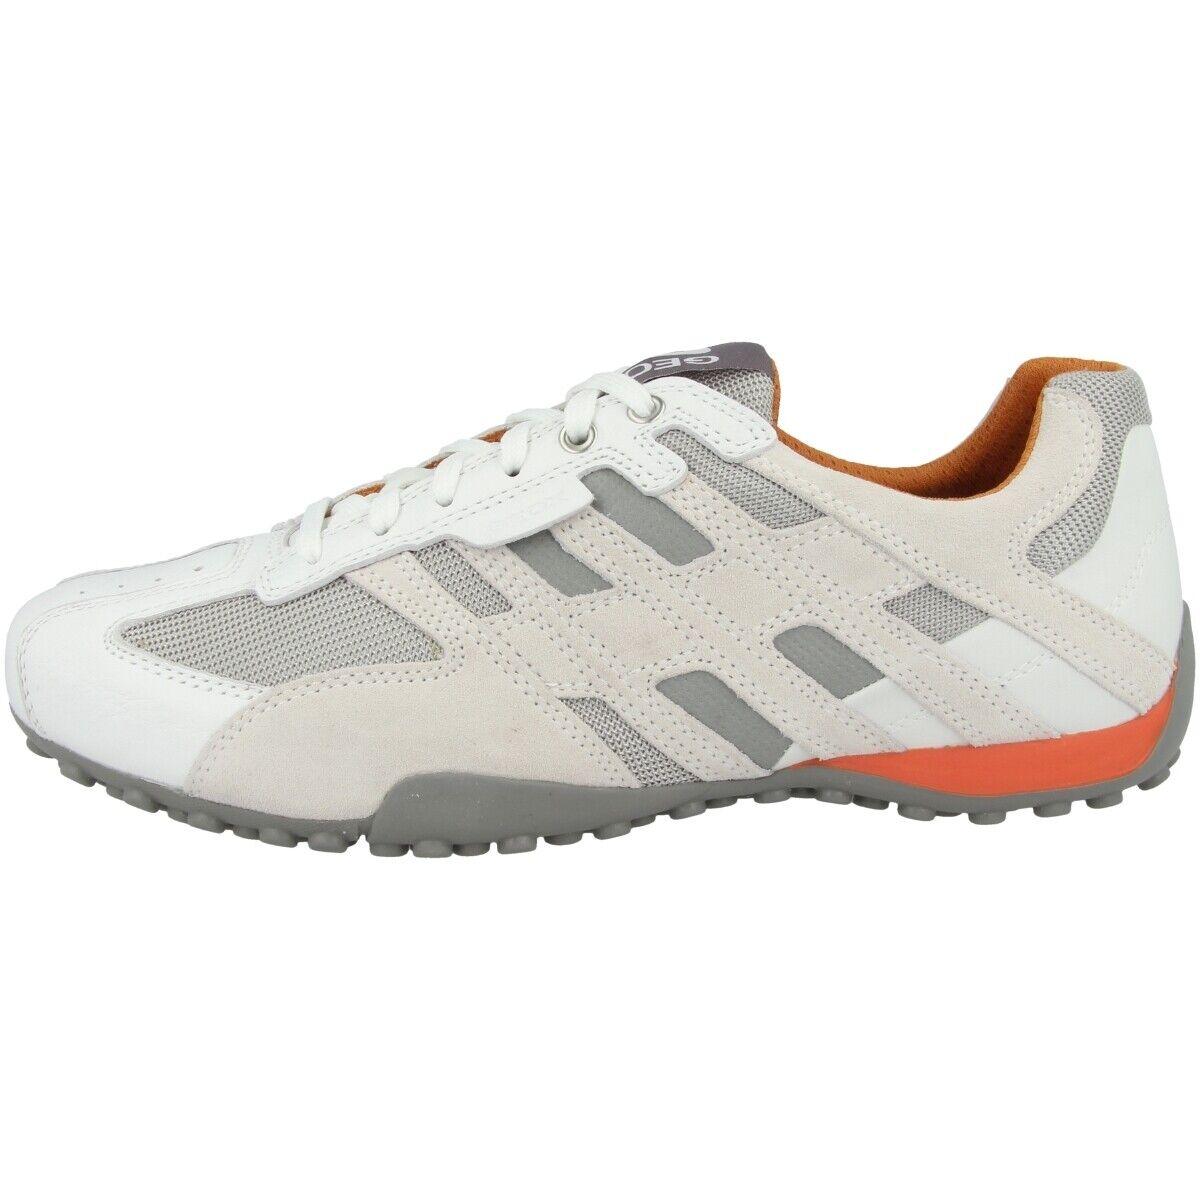 GEOX U Snake K Schuhe Herren Sneaker Leder Halbschuhe Schnürer U4207K08514C1405